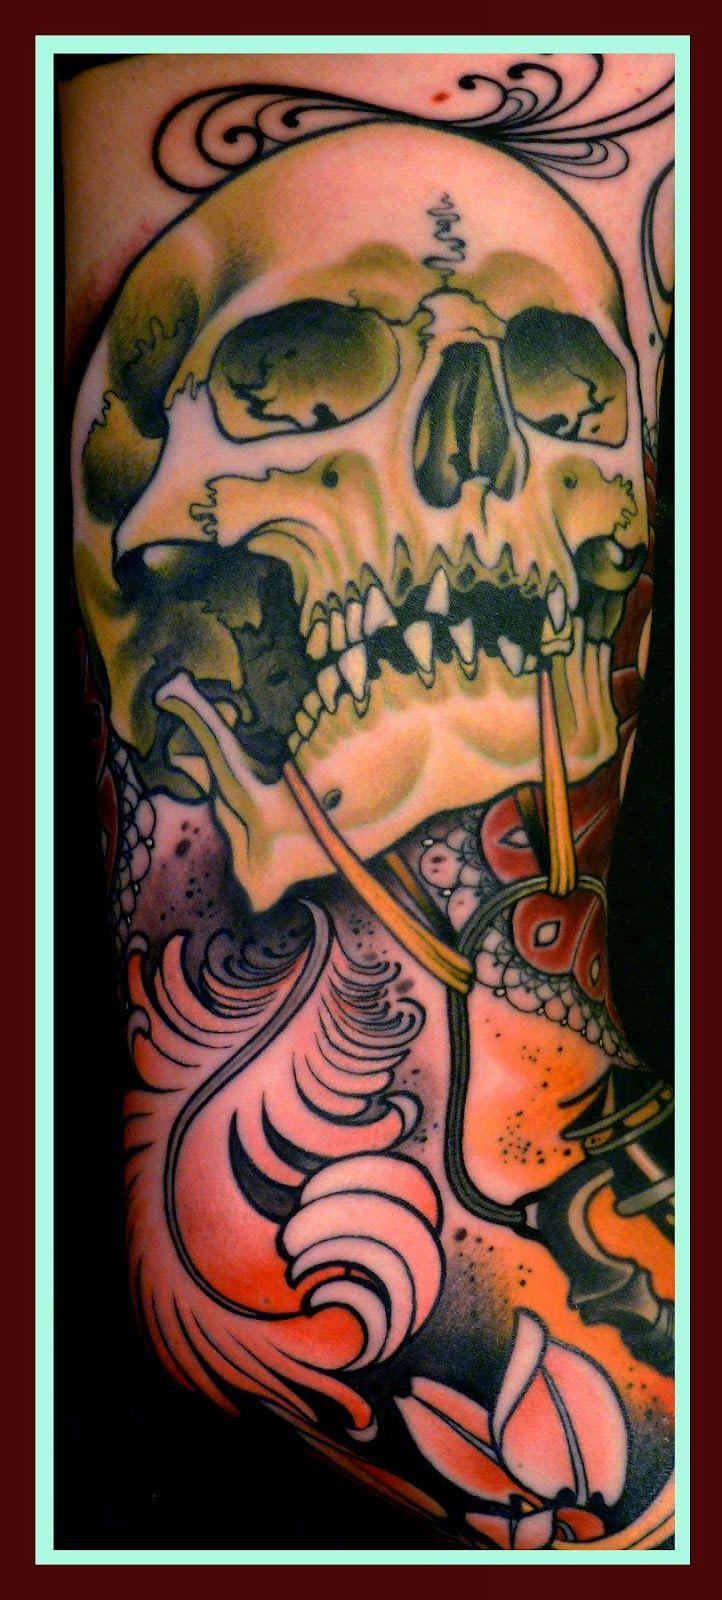 Brad Nowell Arm Tattoo | www.imgkid.com - The Image Kid ...